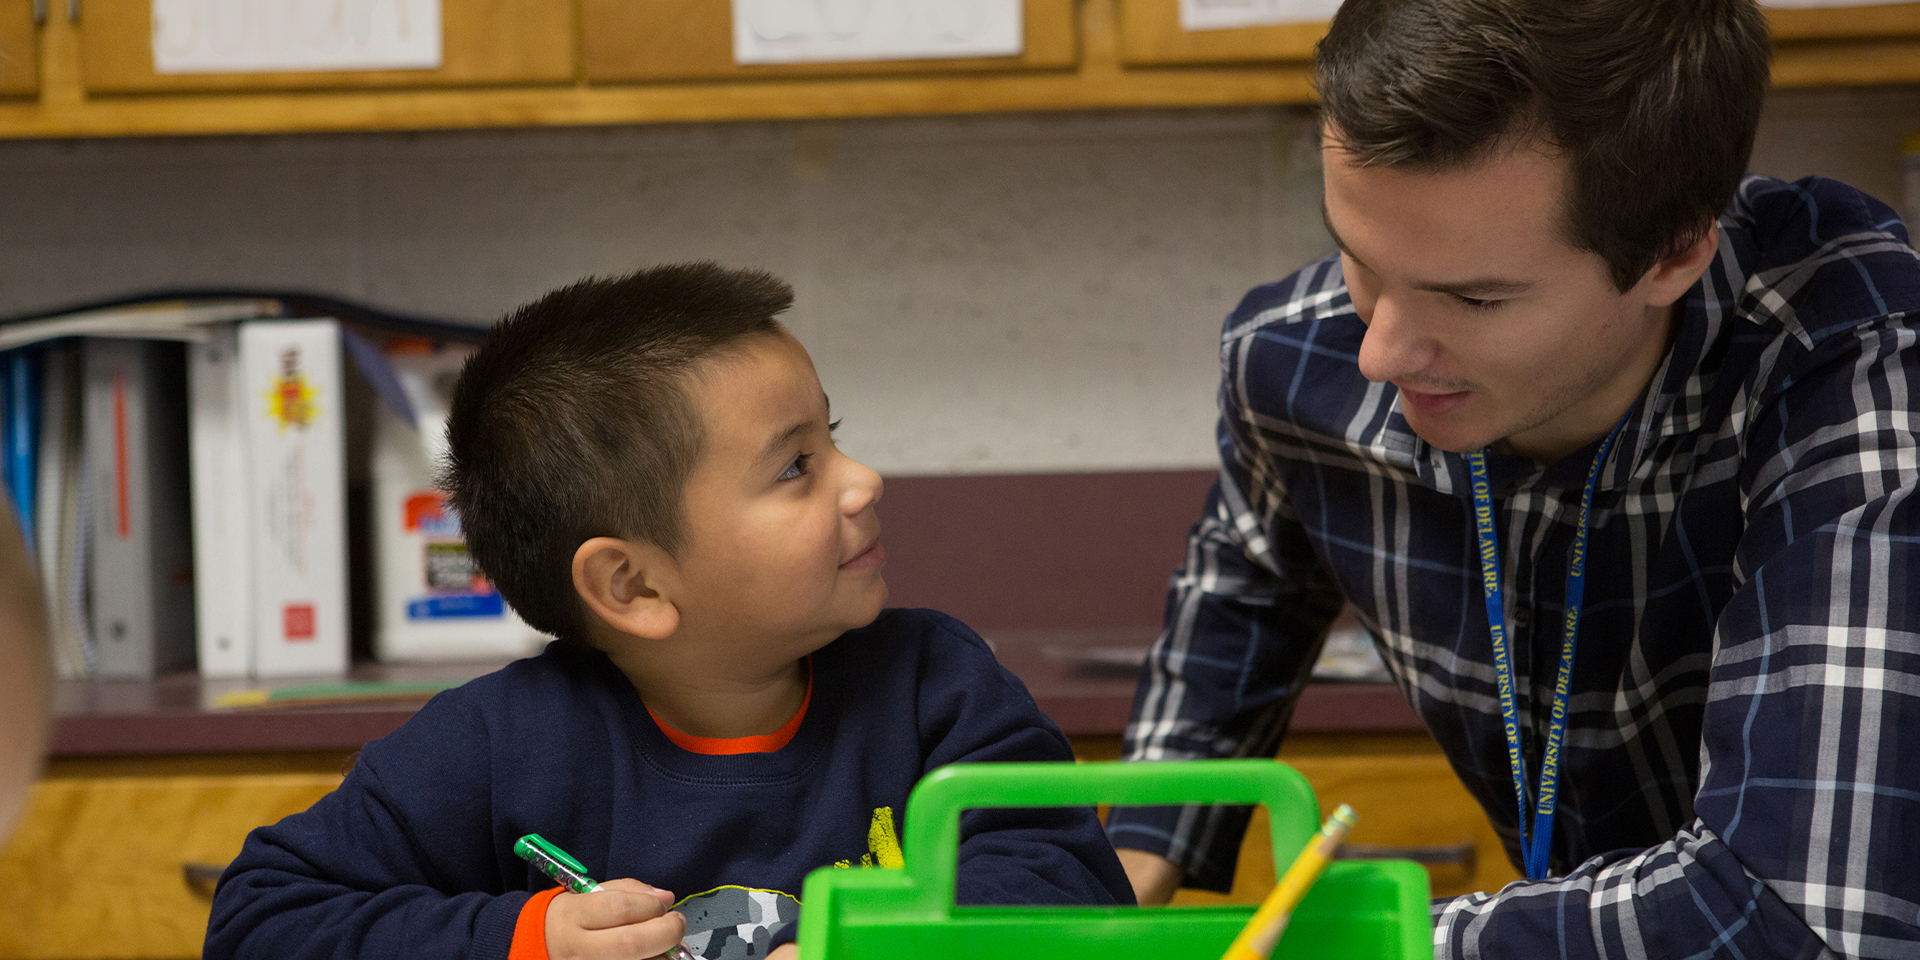 UD student mentors a child